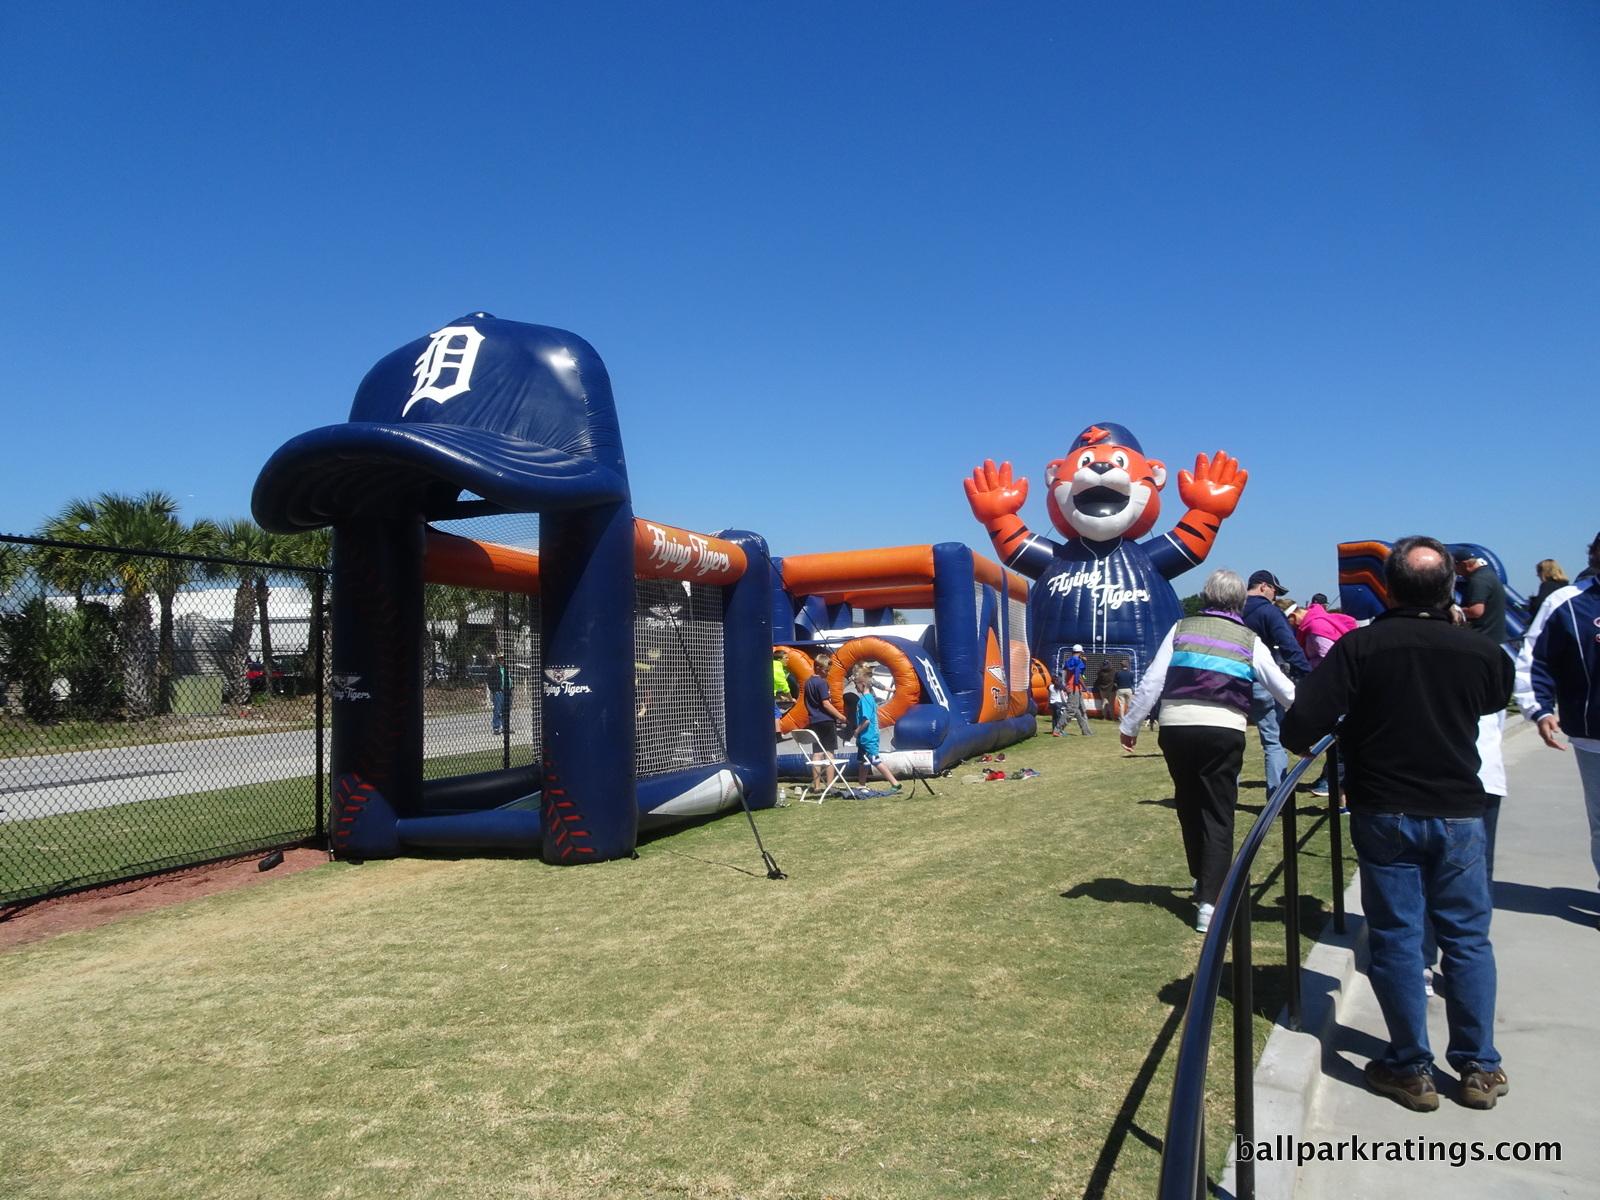 Play area at Publix Field at Joker Marchant Stadium